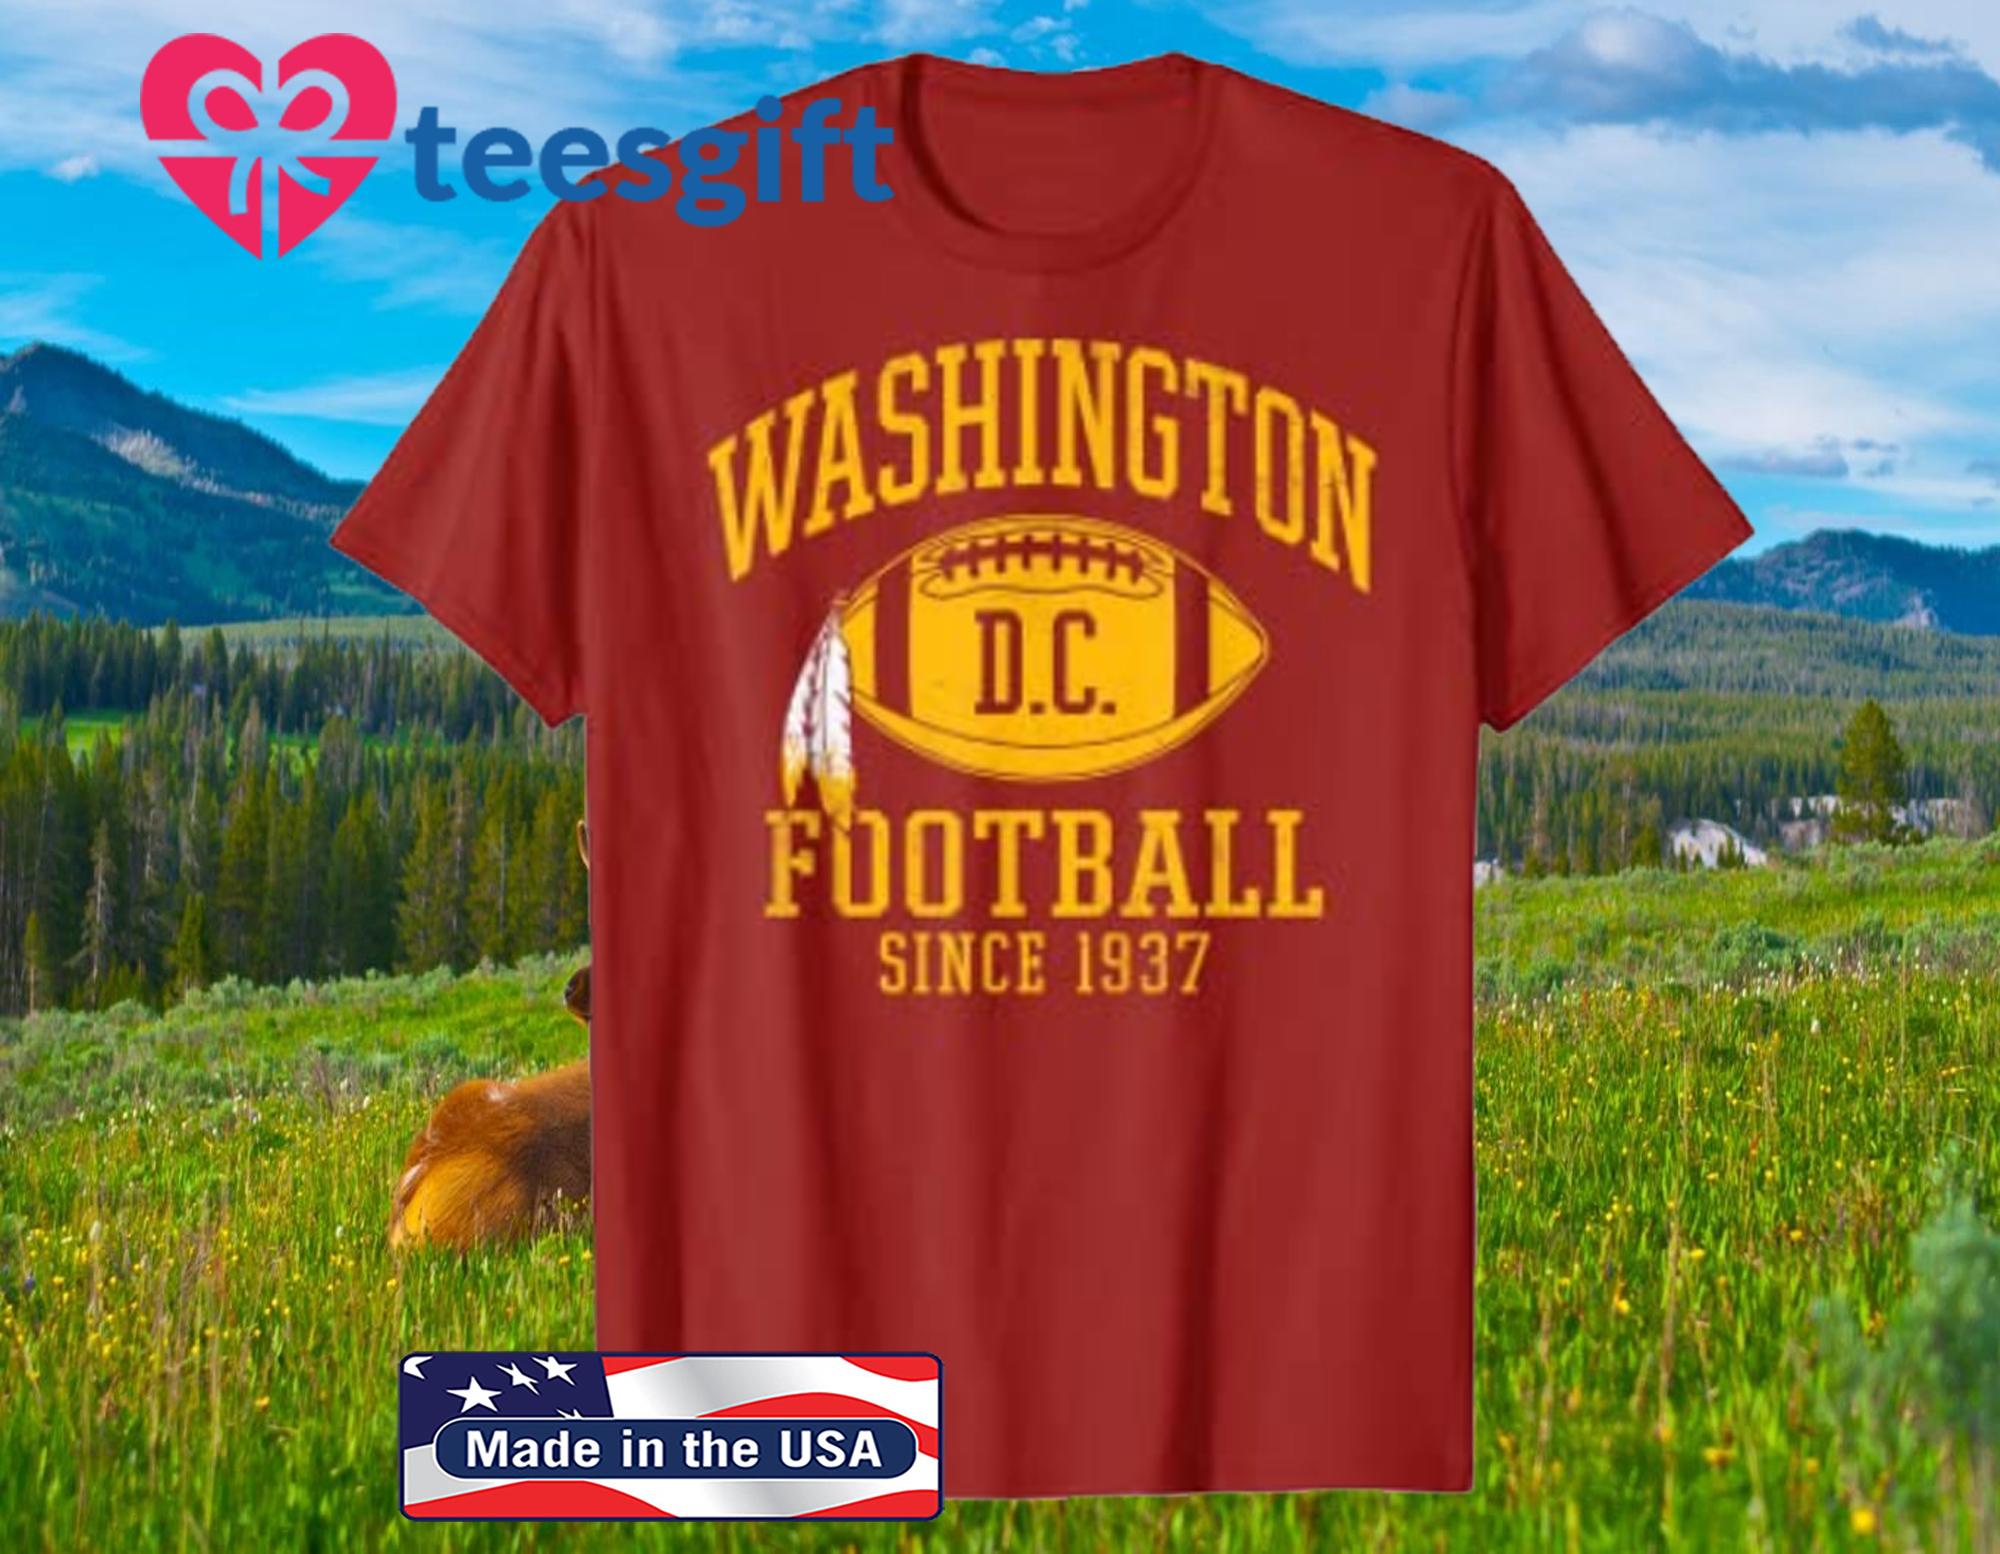 Vintage Washington Football DC Official T-Shirt